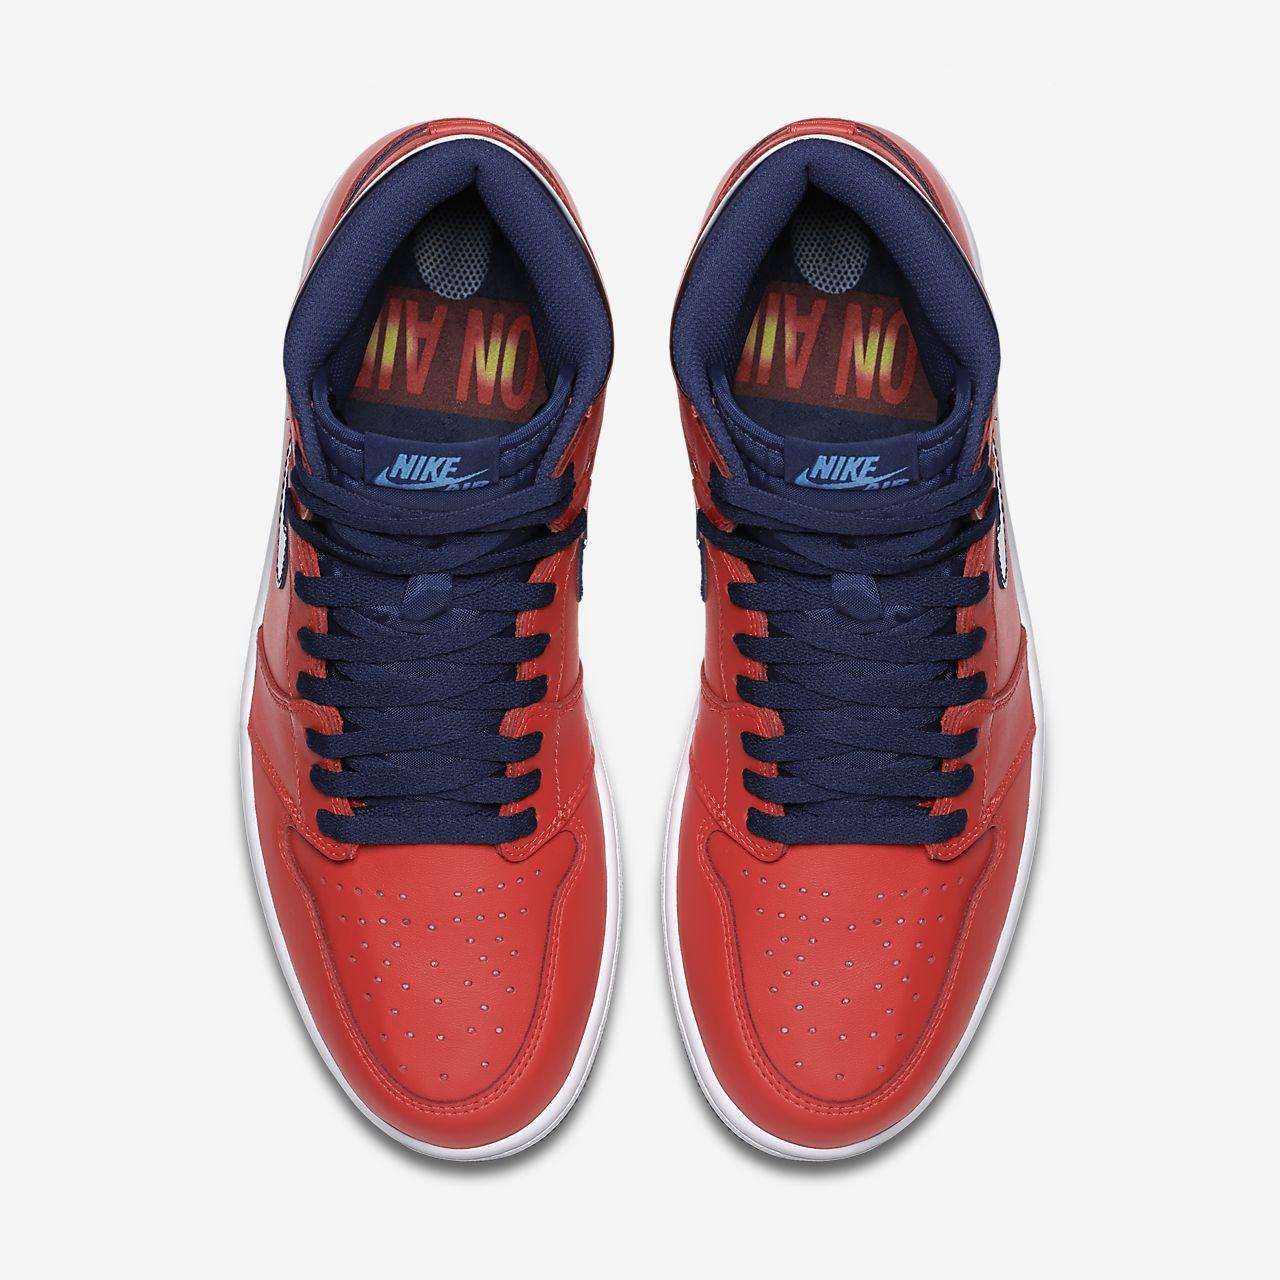 new styles 68f87 f4fa9 ... Air Jordan 1 Retro High OG Shoe